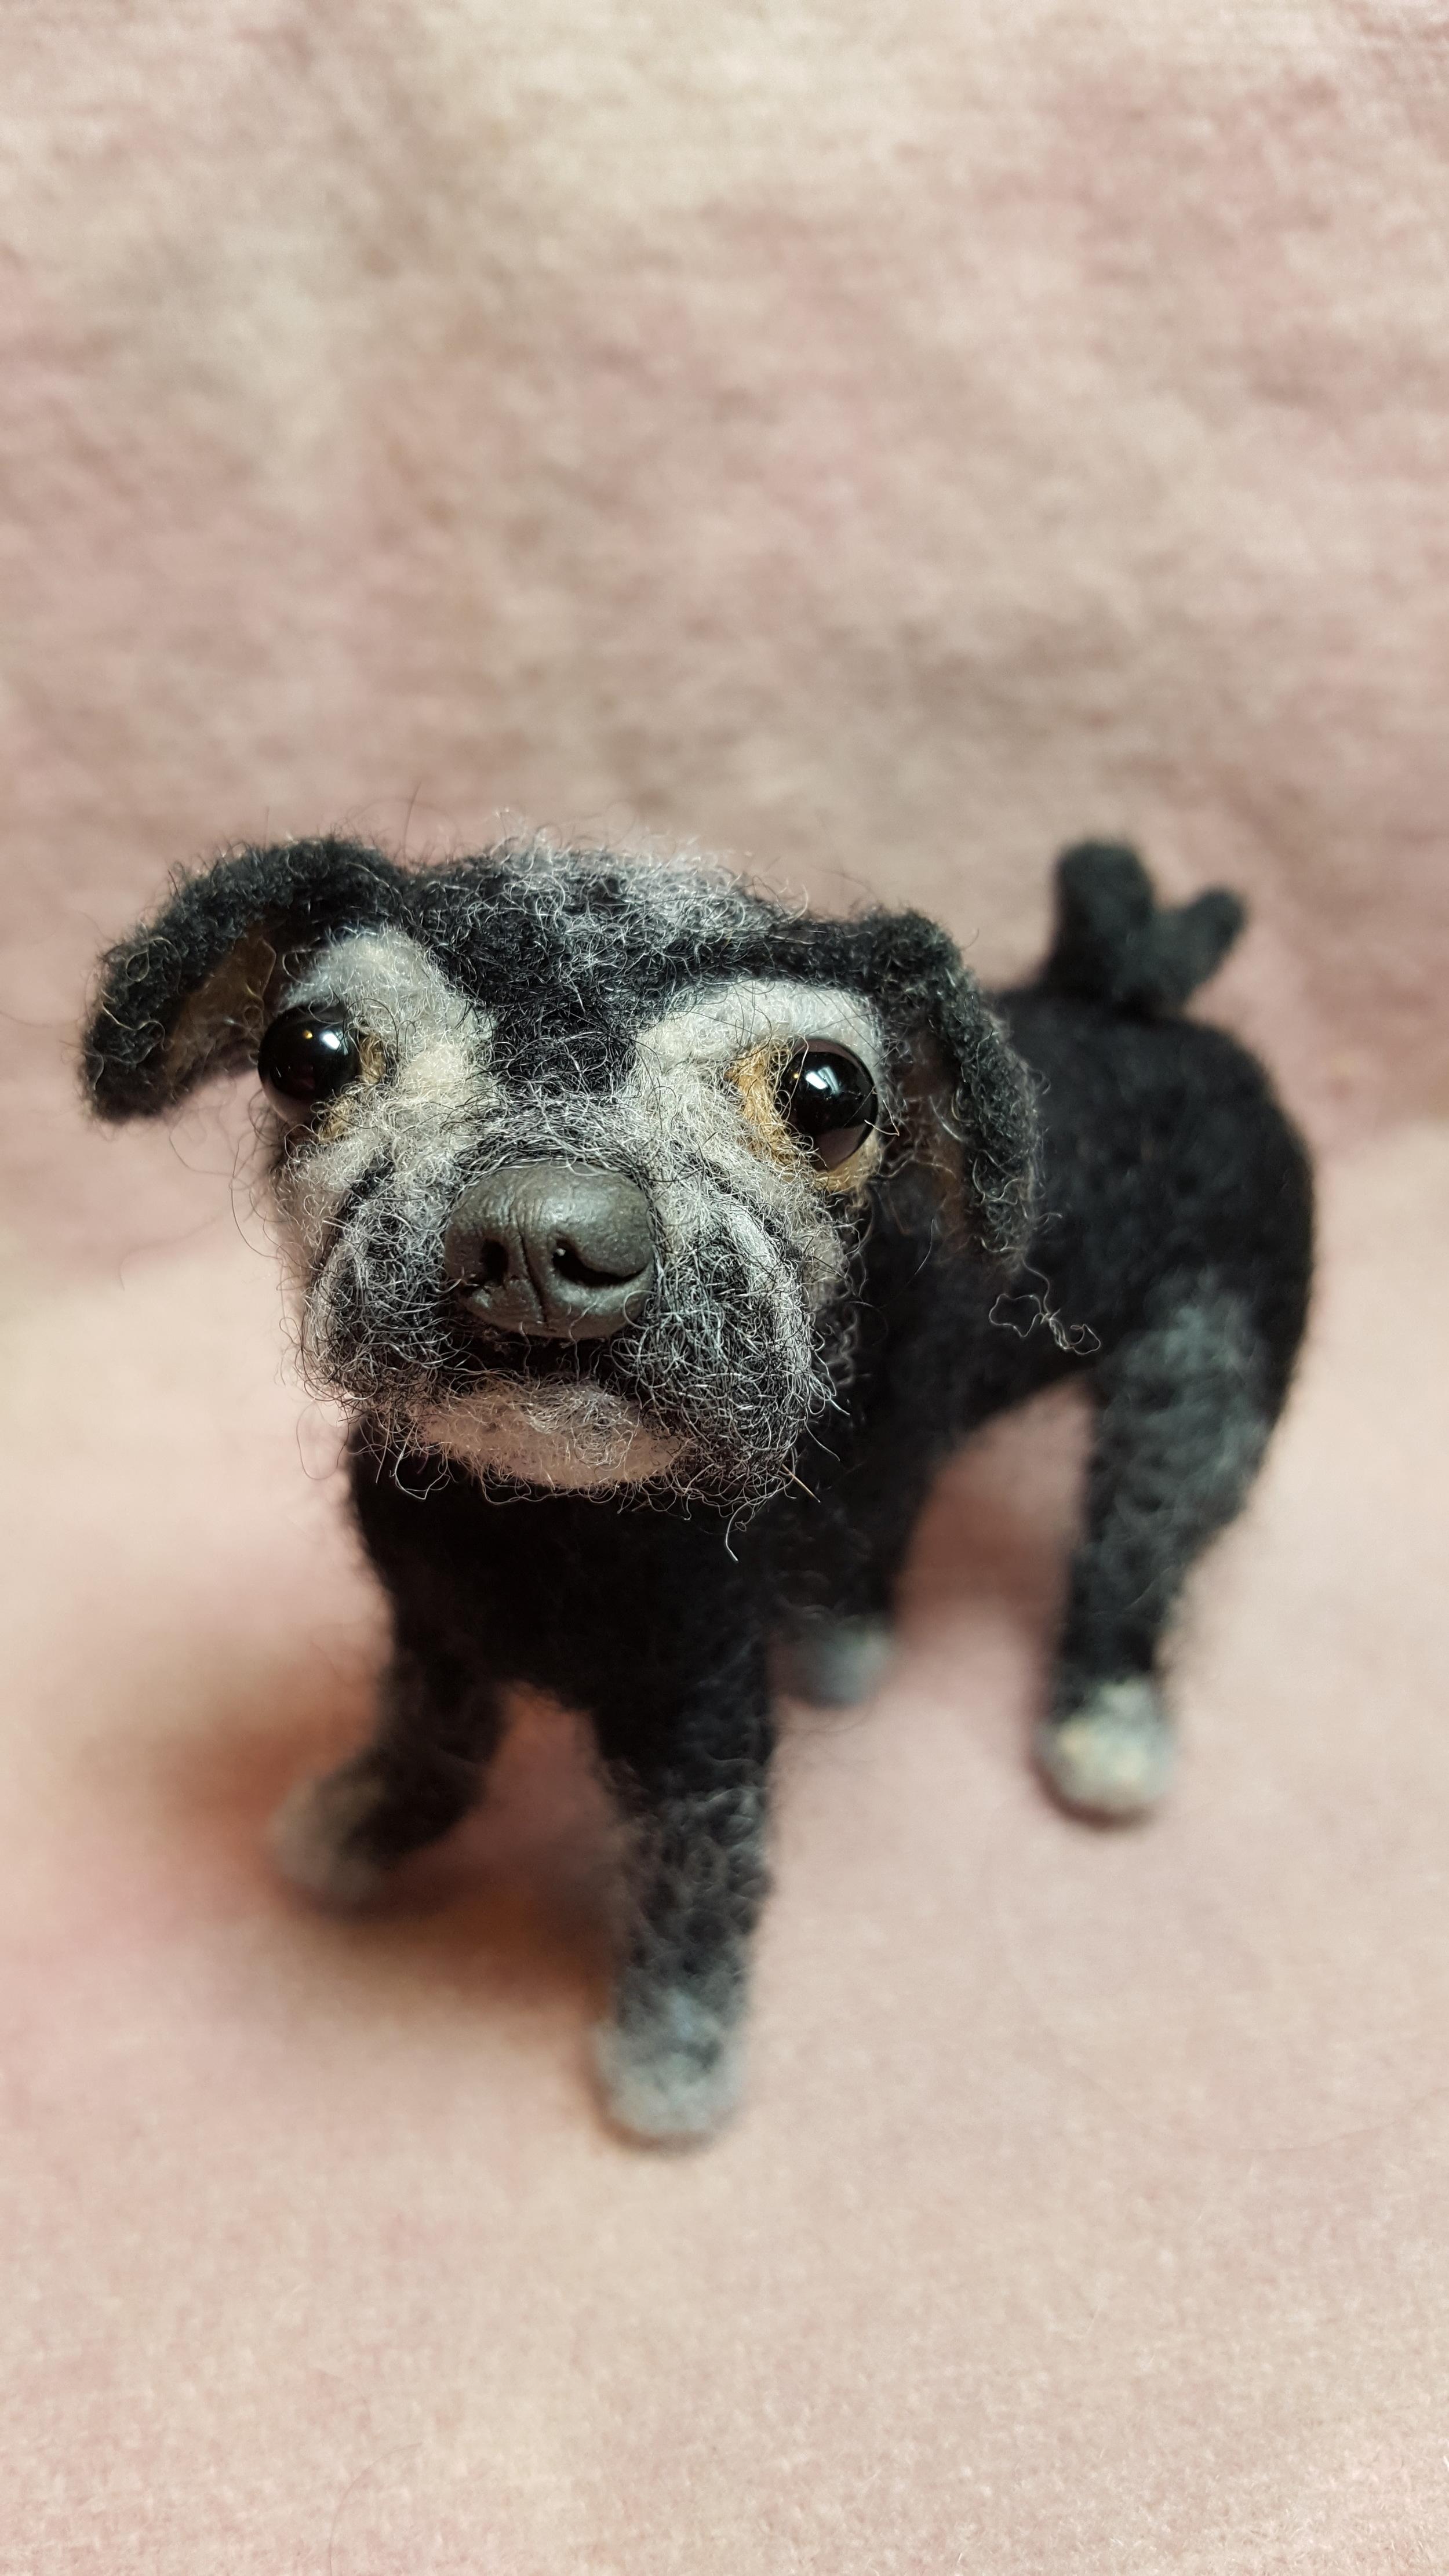 Mimi Louise, an elderly pug